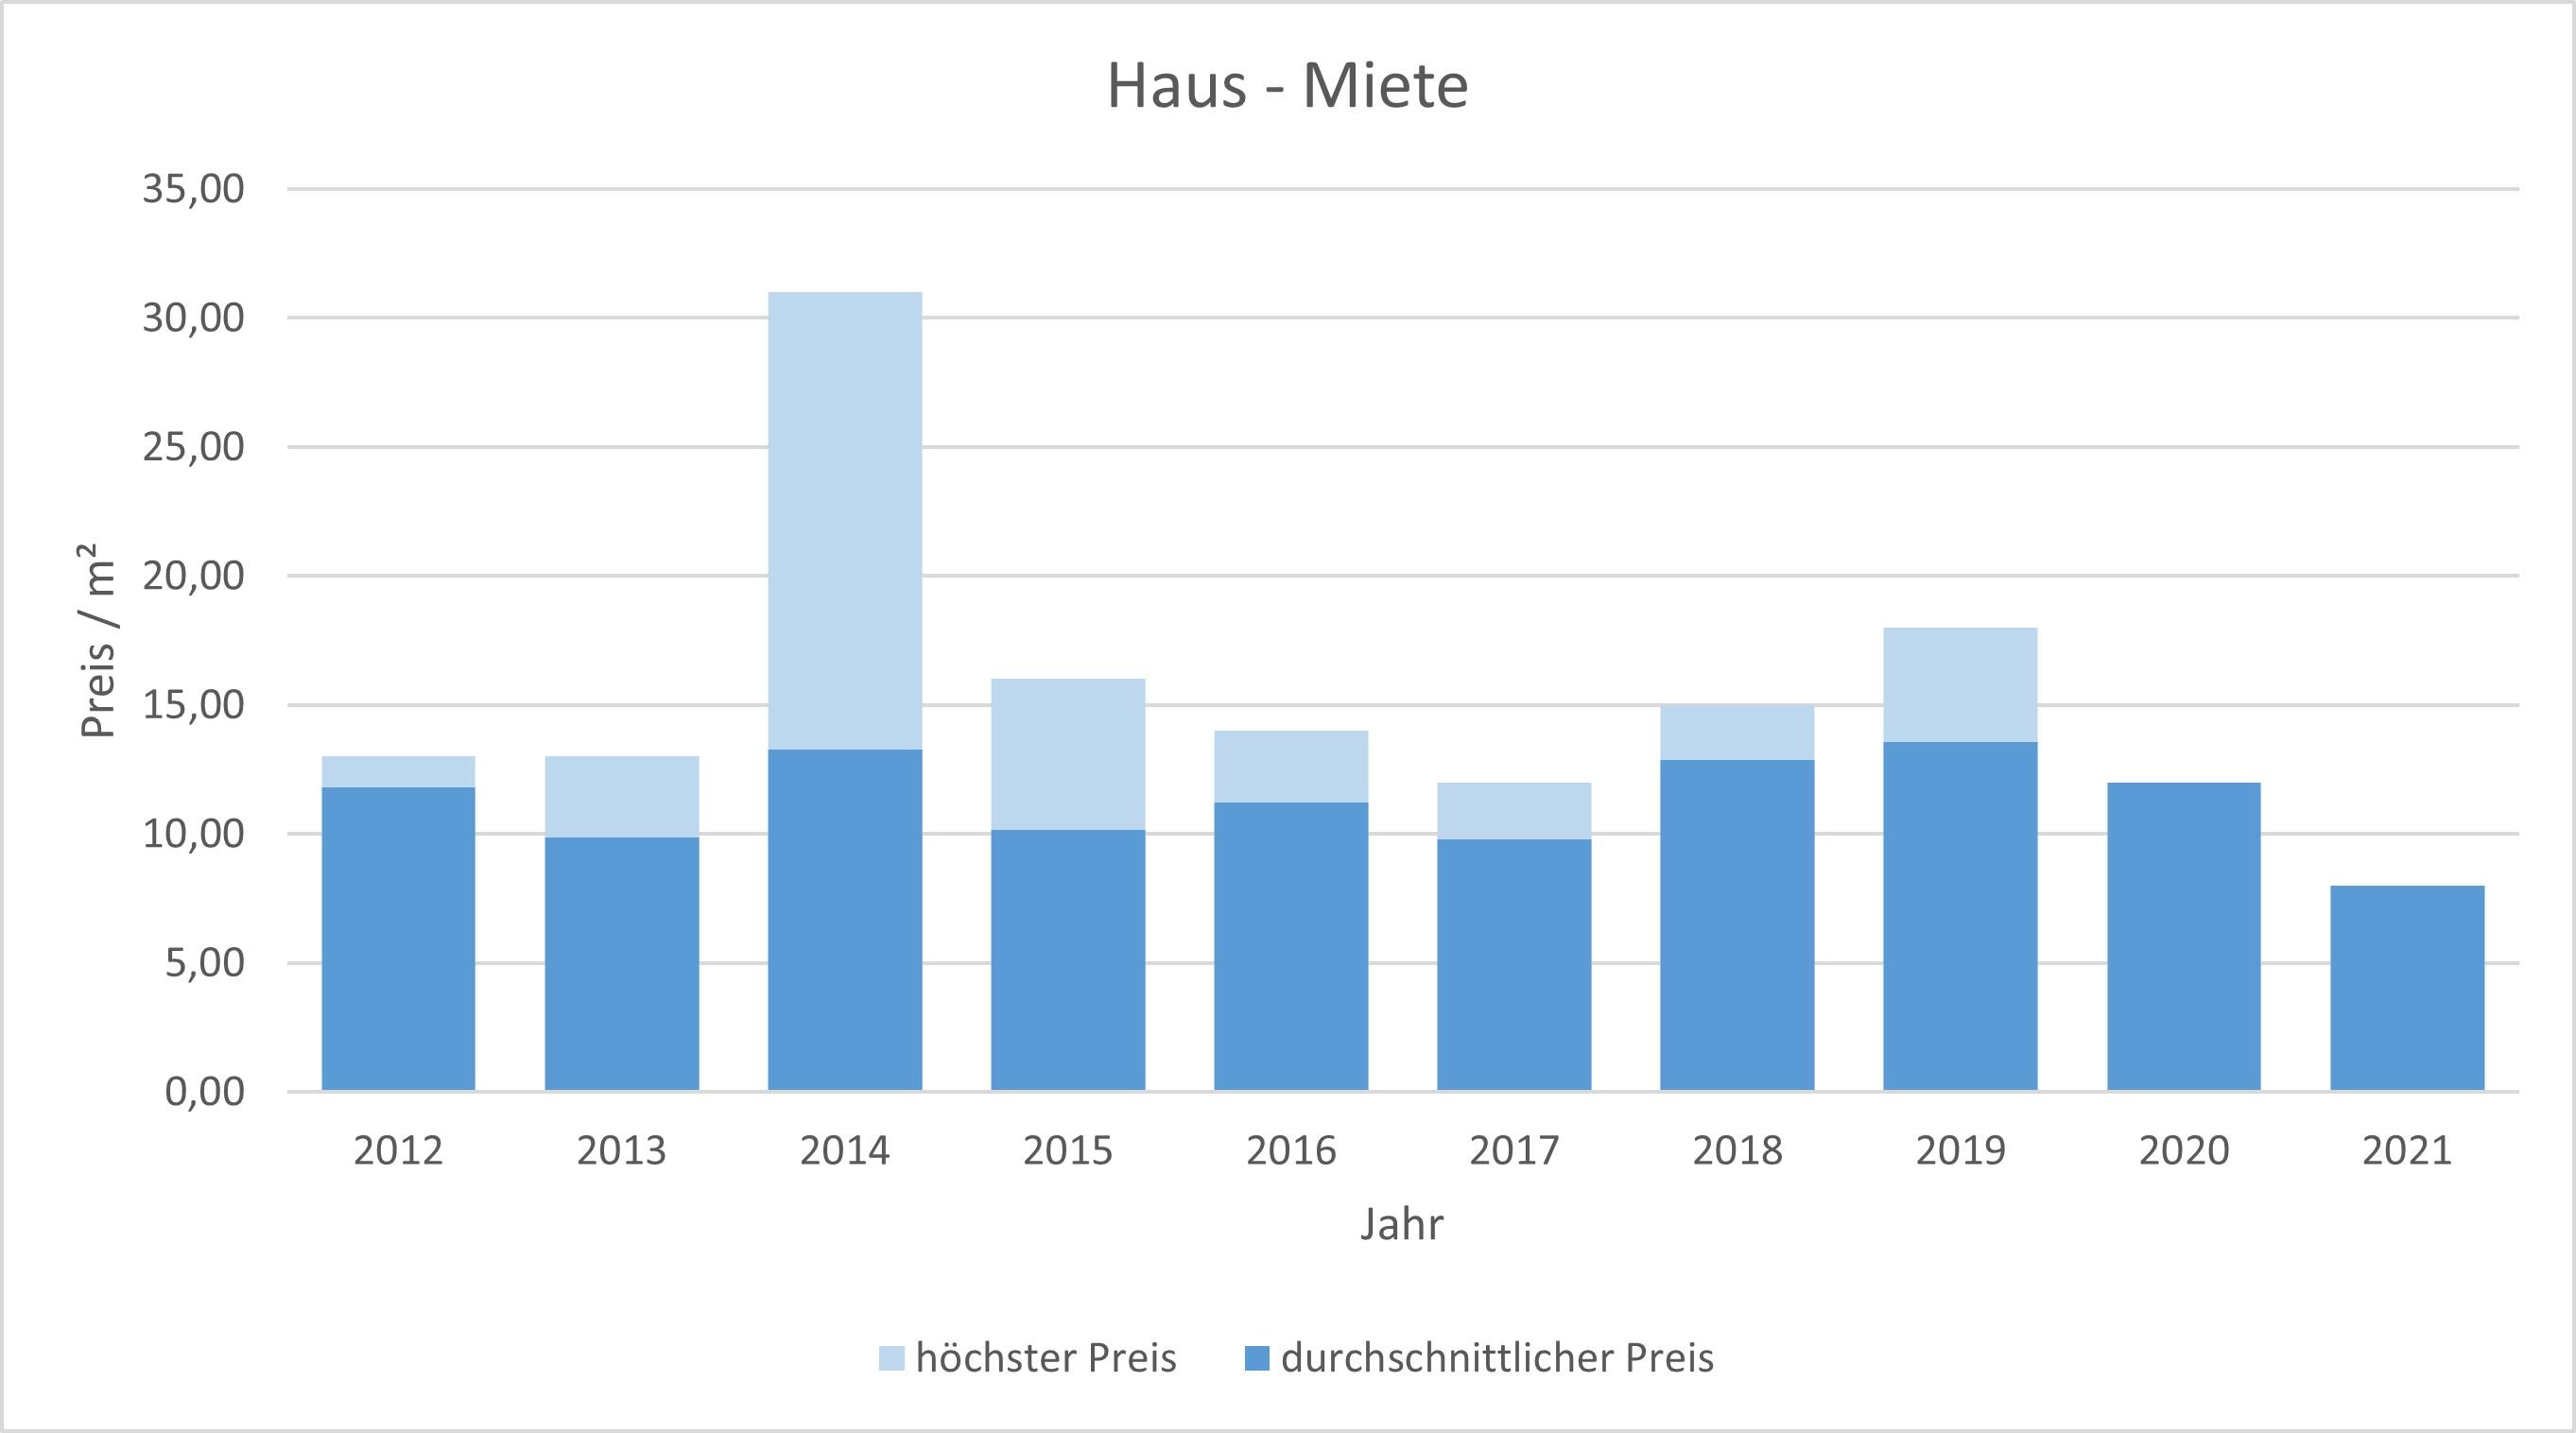 Valley Haus mieten vermieten Preis Bewertung Makler www.happy-immo.de 2019 2020 2021